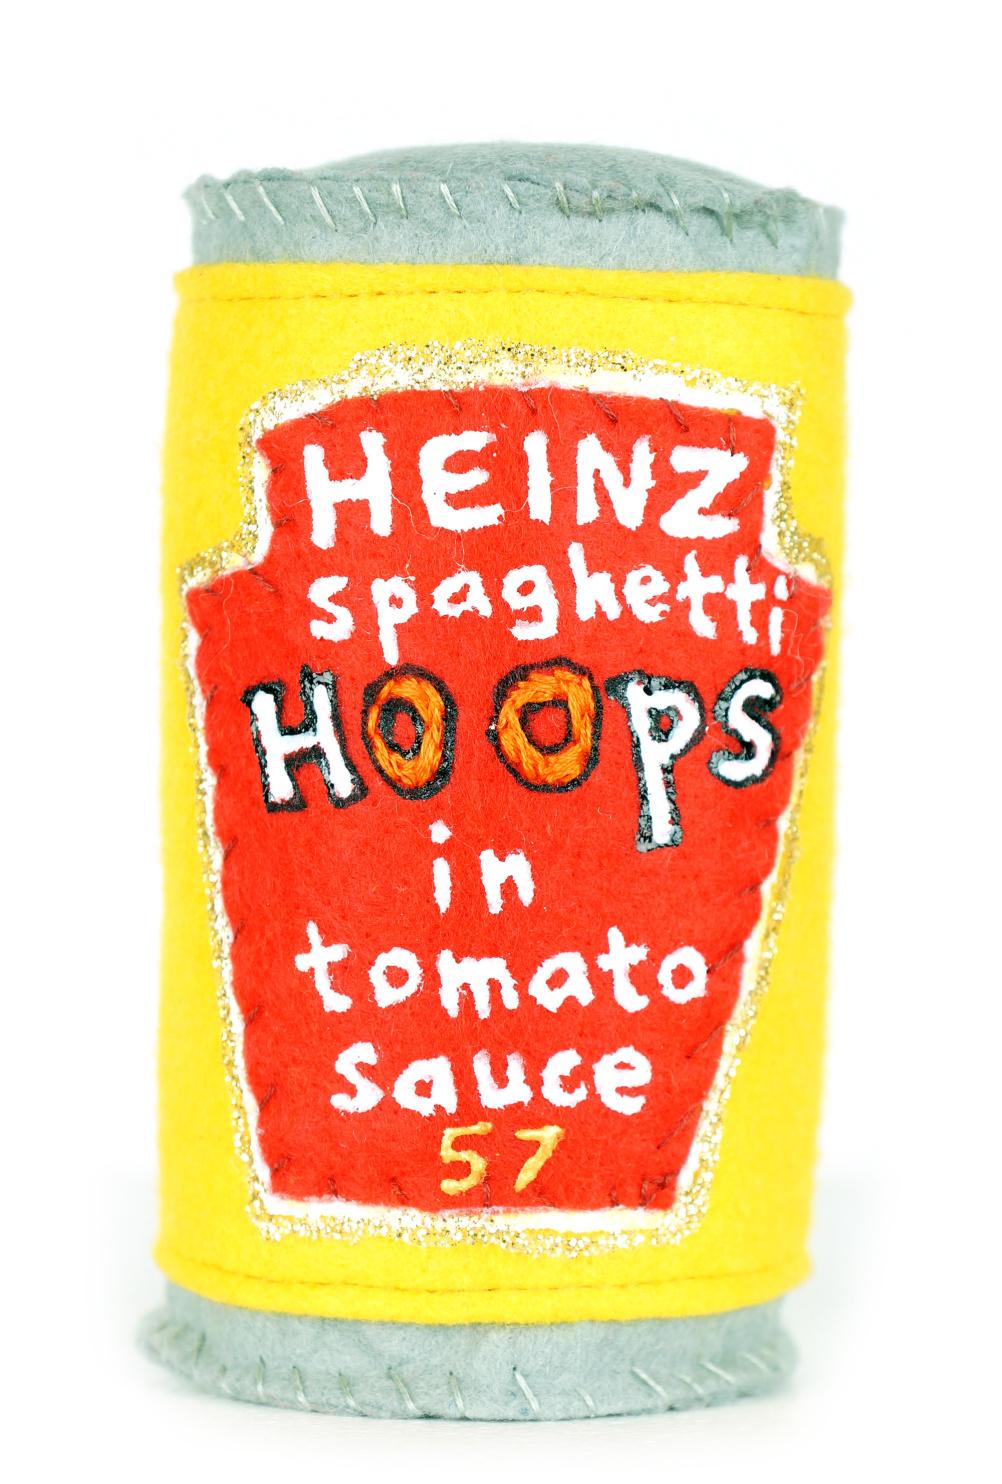 Felt spaghetti hoops